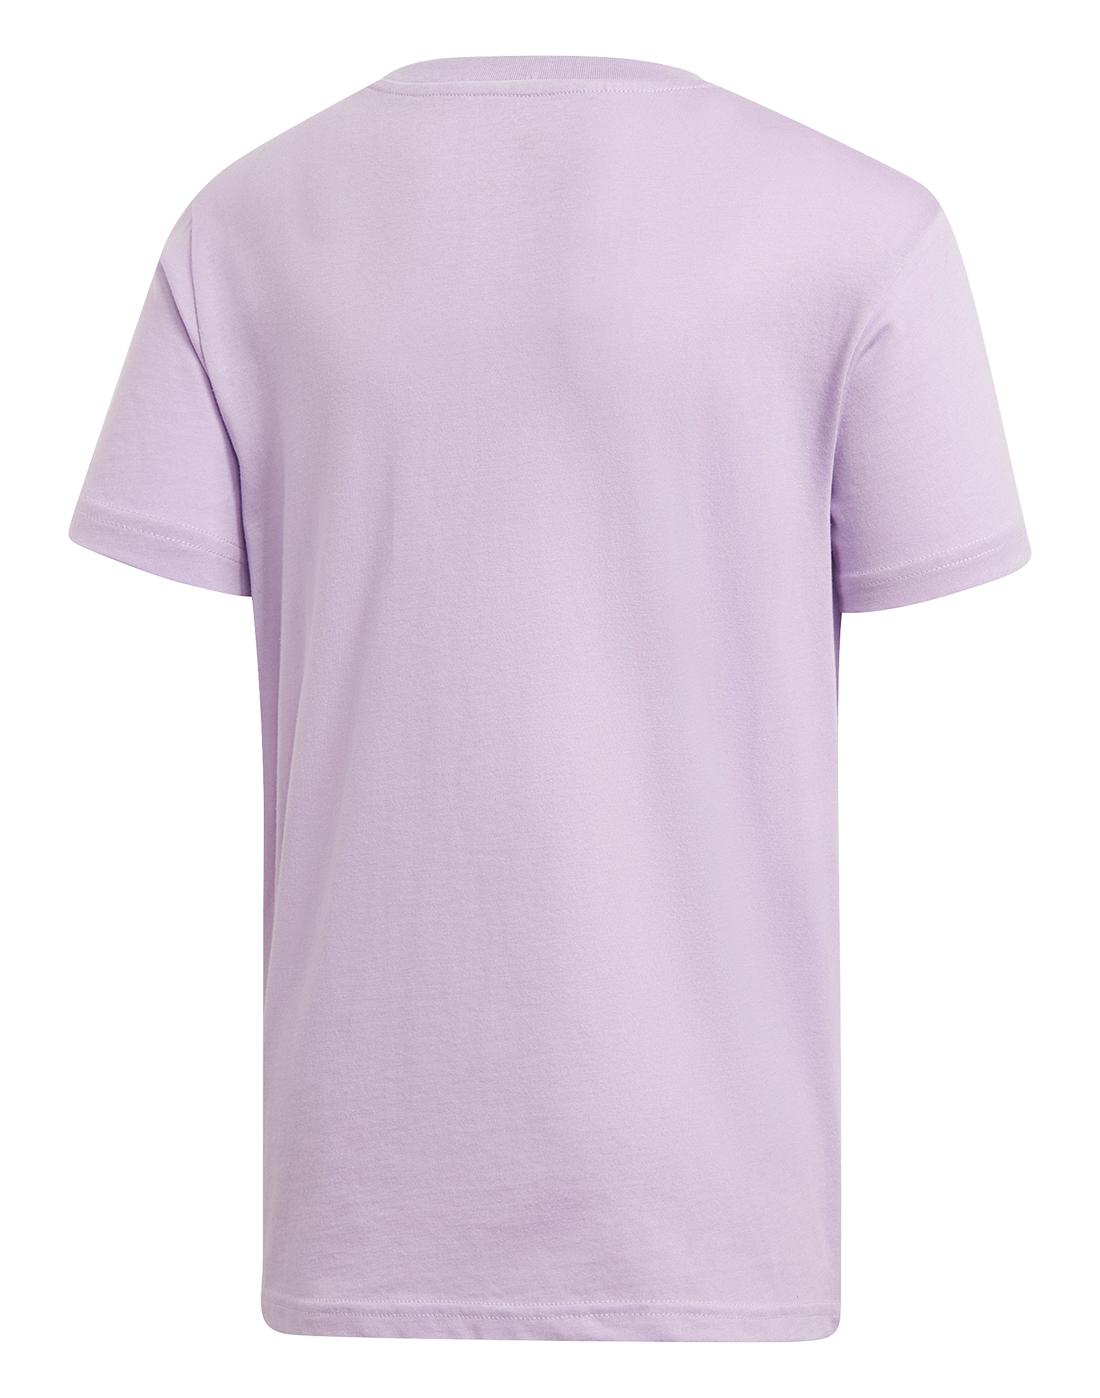 45ecdc45248f3 adidas Originals. Older Girls Trefoil T-Shirt. Older Girls Trefoil T-Shirt  · Older Girls Trefoil T-Shirt